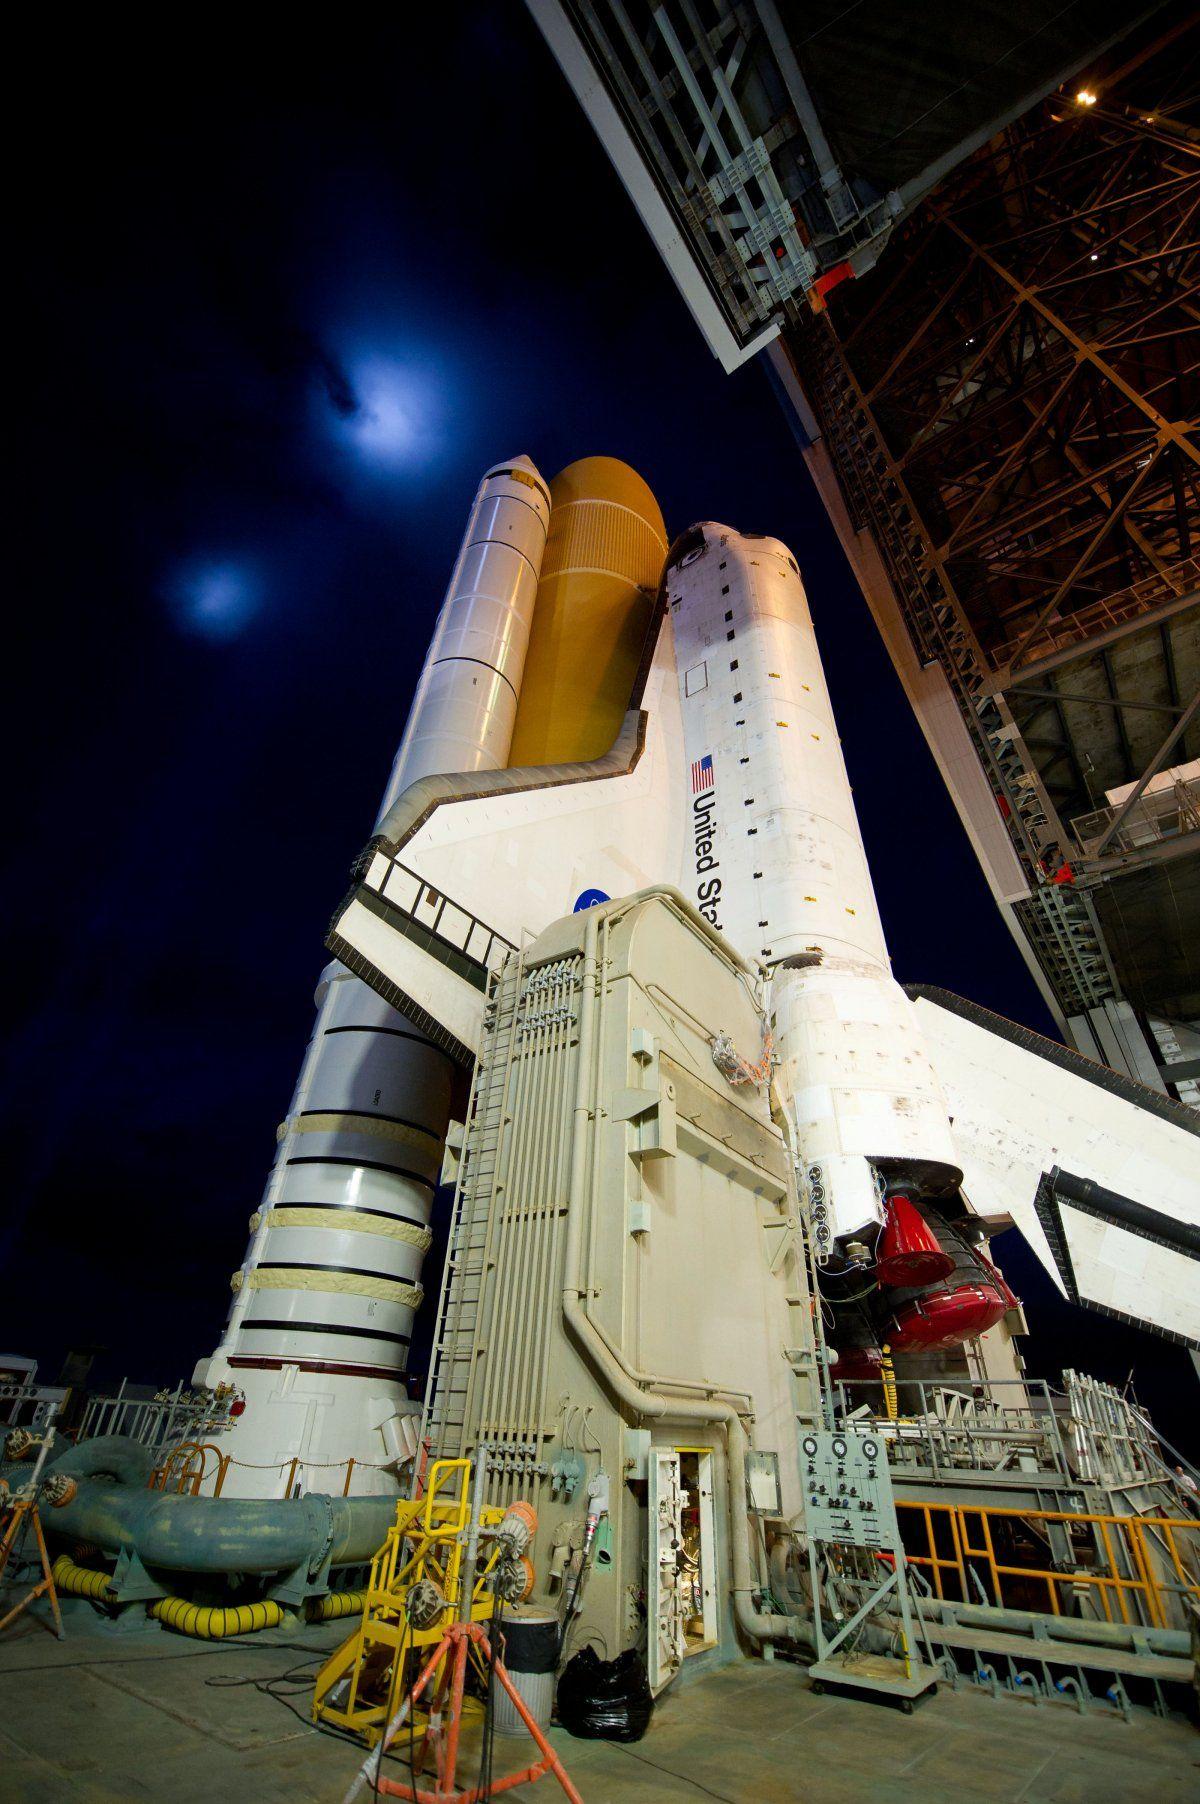 flight of space shuttle program - photo #5